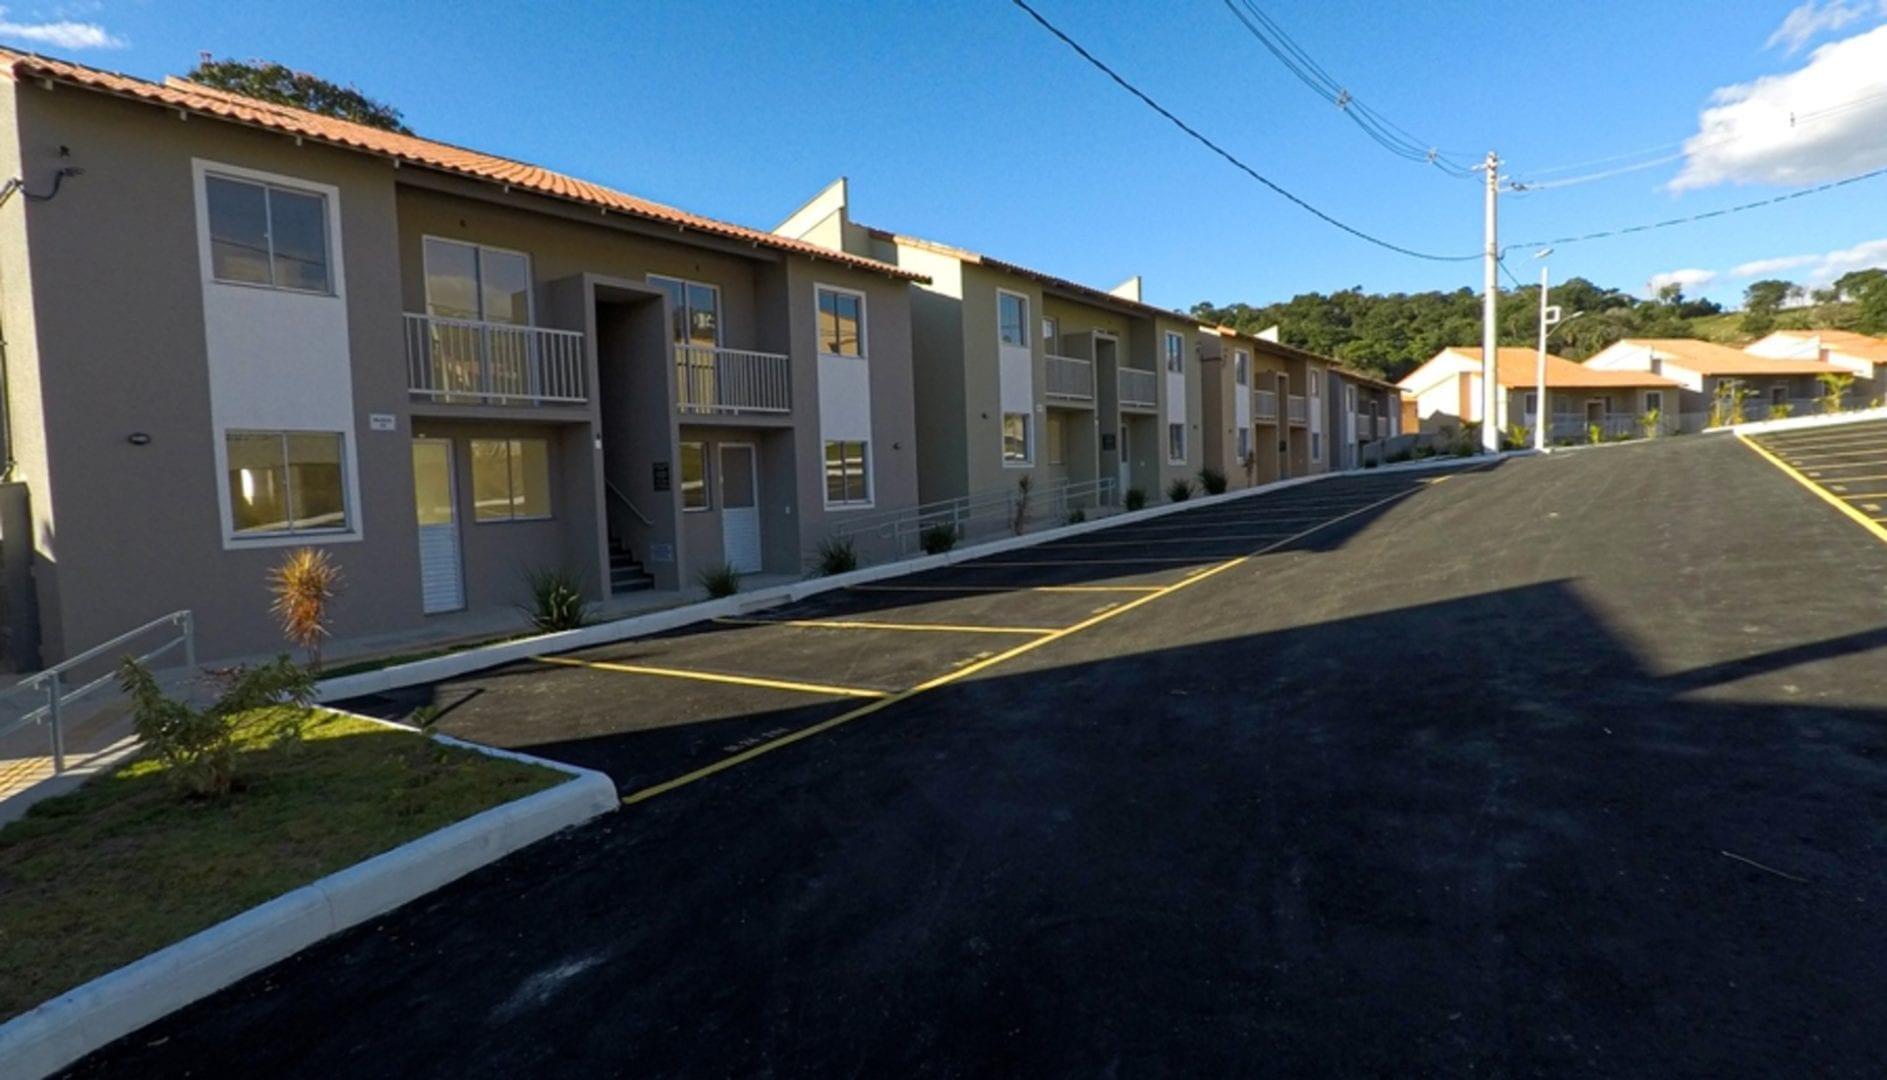 Villa Bella Lyon - DCIM100GOPROGOPR0647.JPG